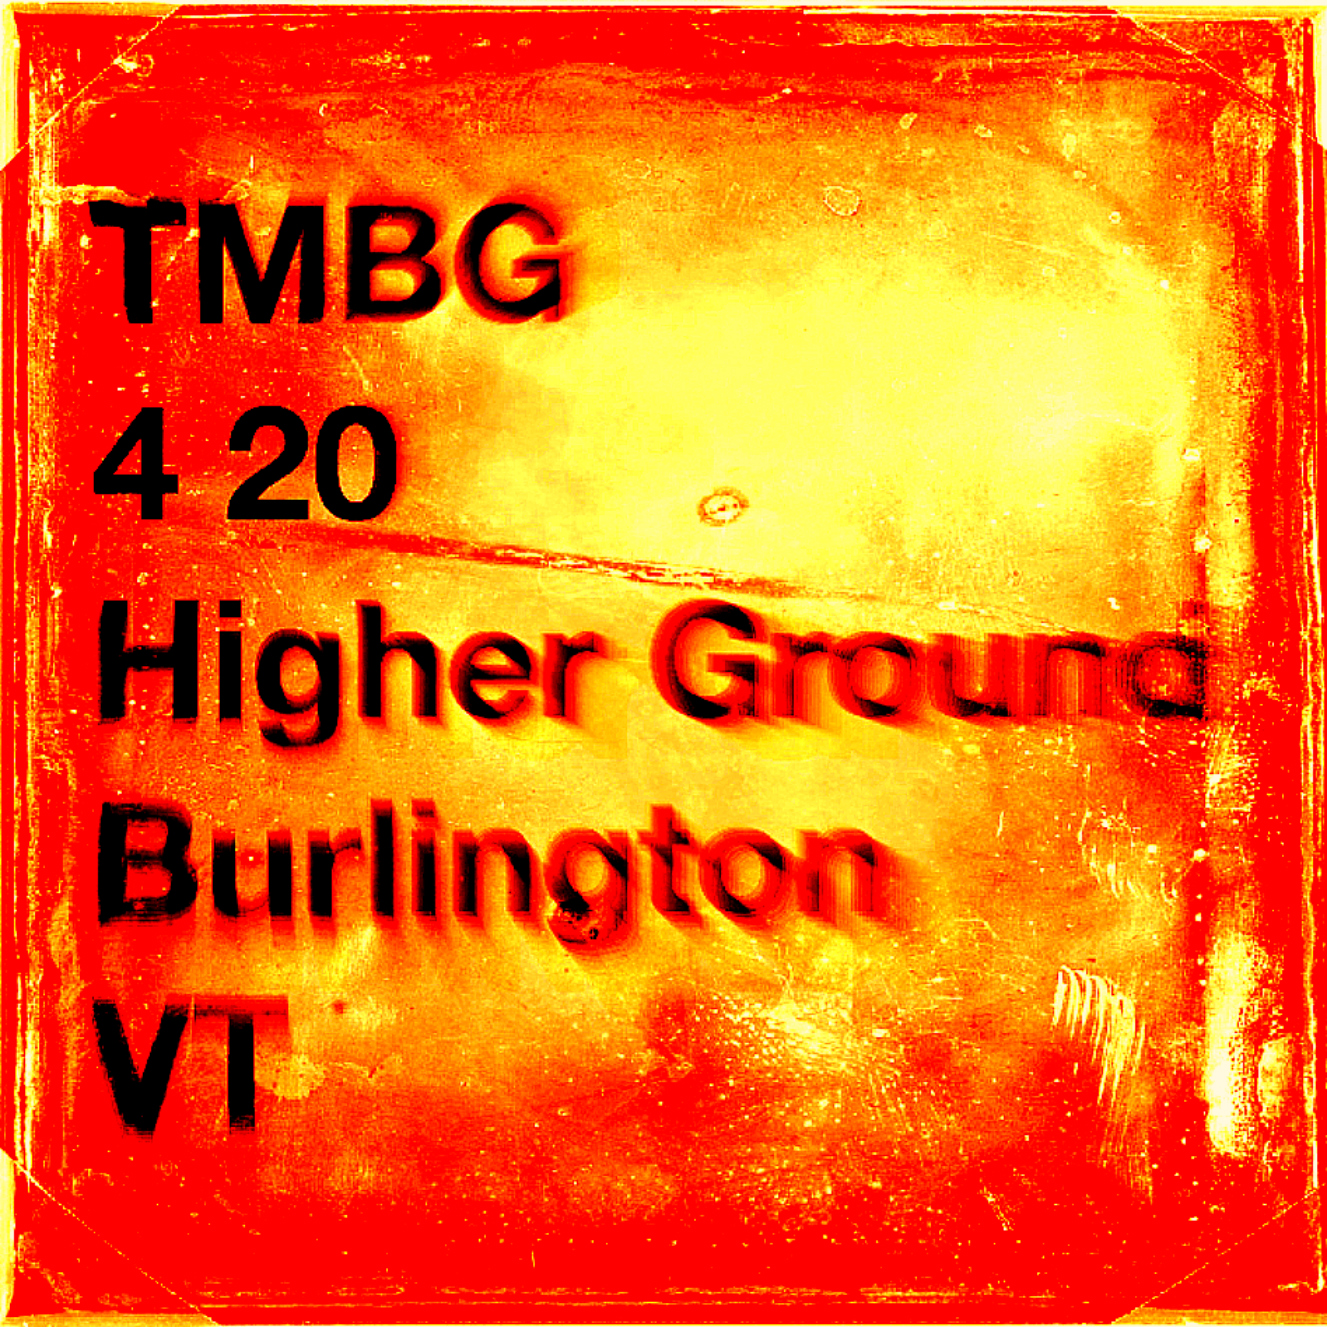 4.20 TMBG Higher poster II.jpg